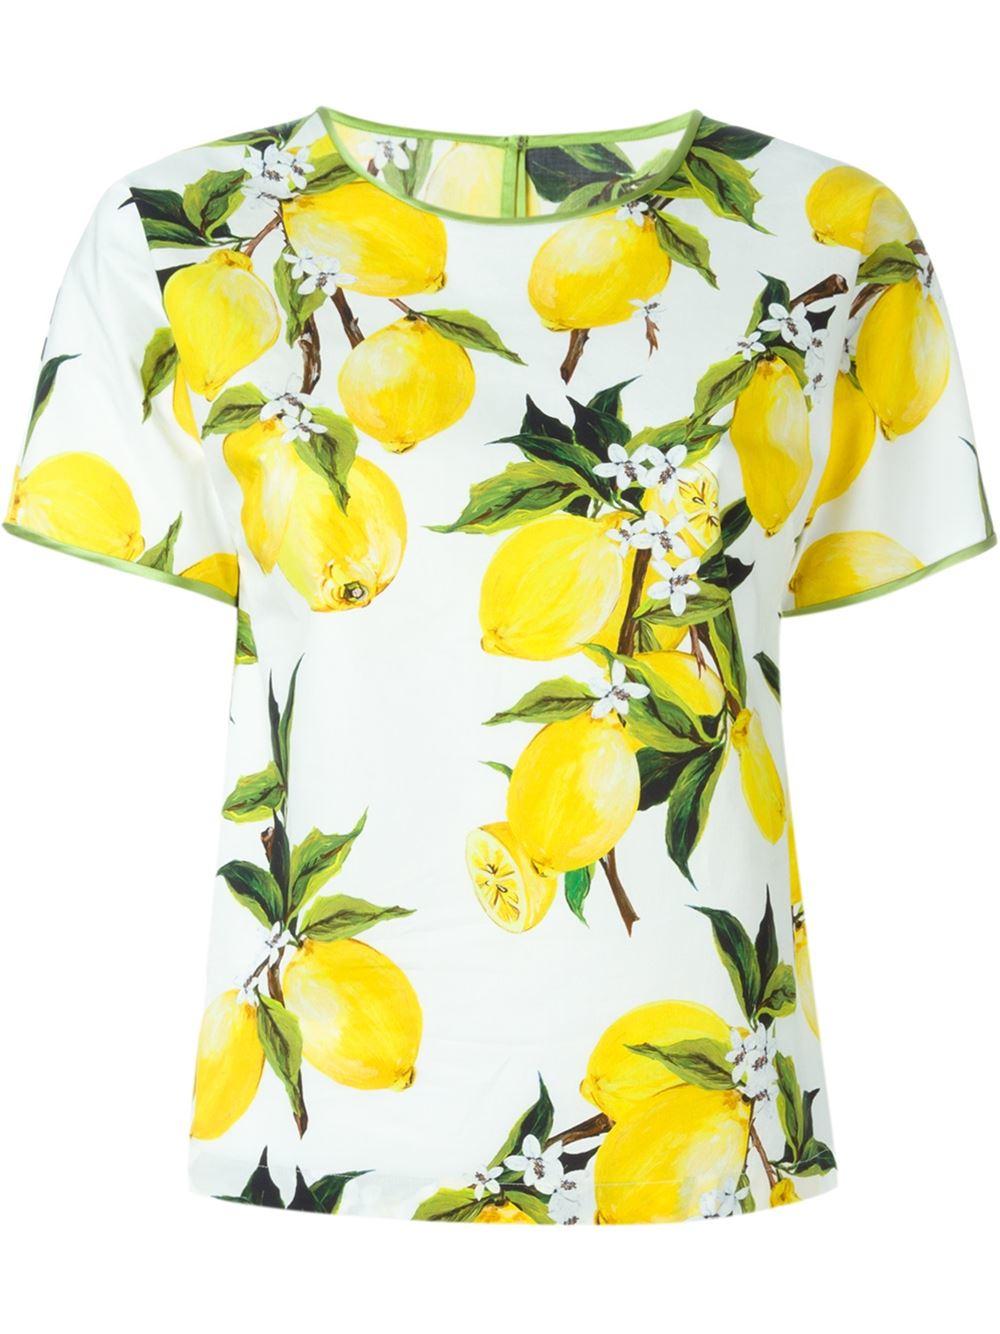 954a8a48 Dolce & Gabbana Lemon Print Top - Lyst